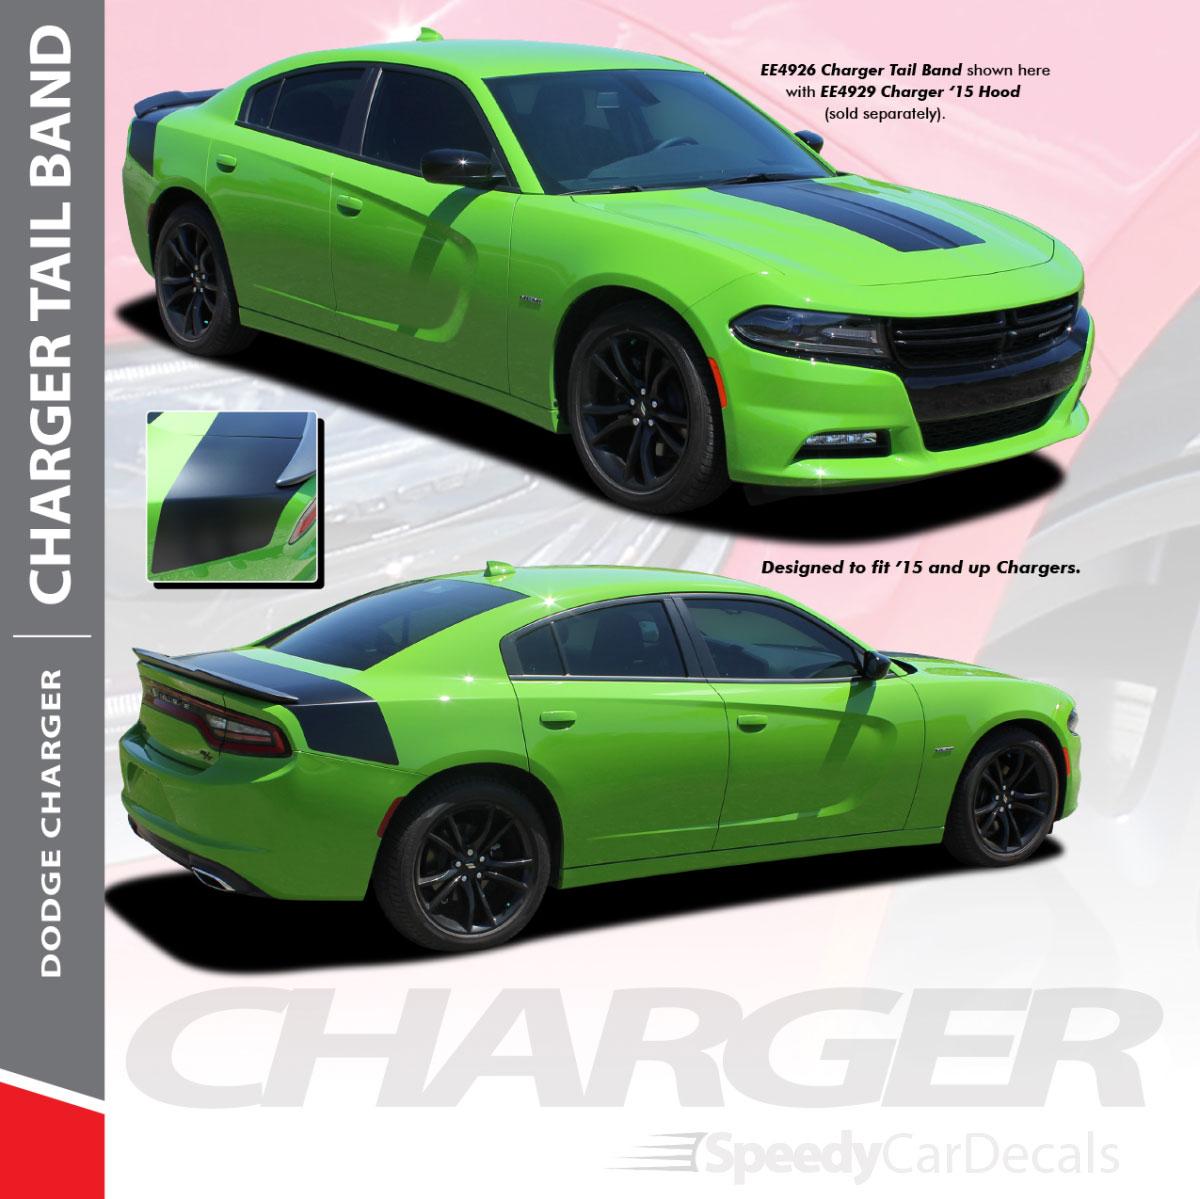 2017 dodge charger rt daytona decals upgrades tailband 2015 2018 2017 Dodge Ram tailband 15 2015 2018 2019 dodge charger hemi daytona r t srt 392 2017 dodge charger rt